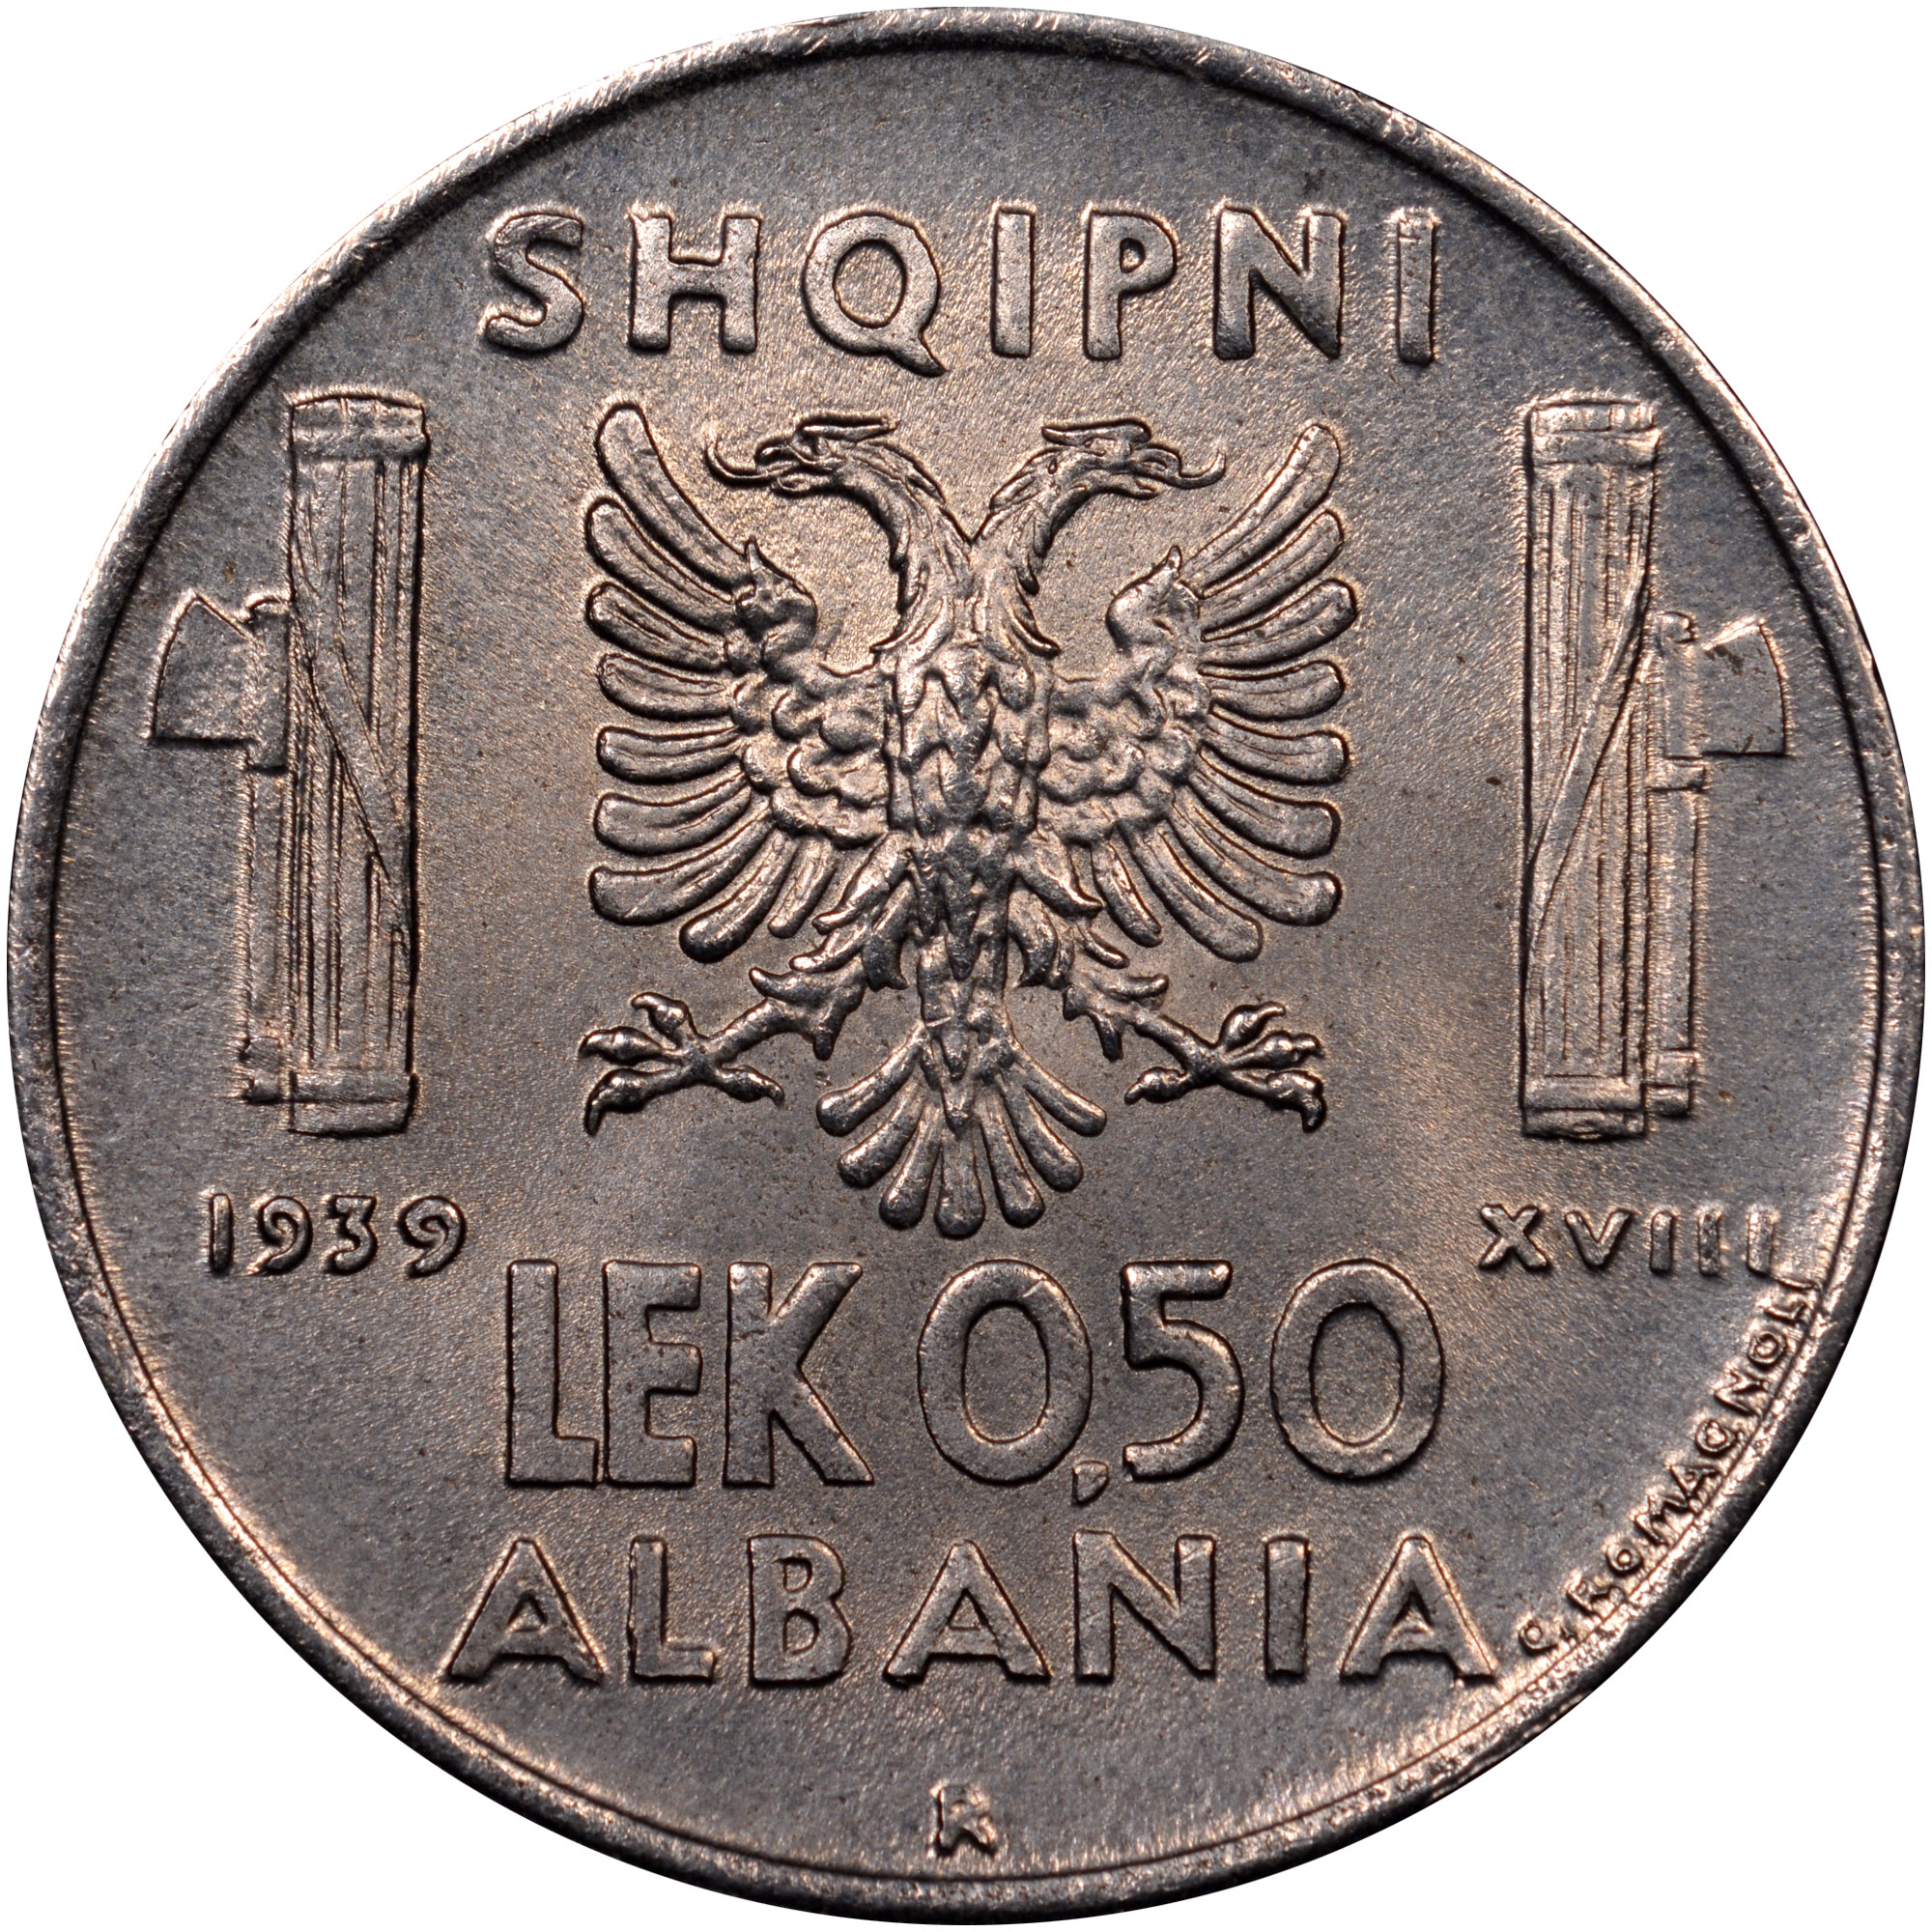 1939-1941 Albania 0.50 Lek reverse